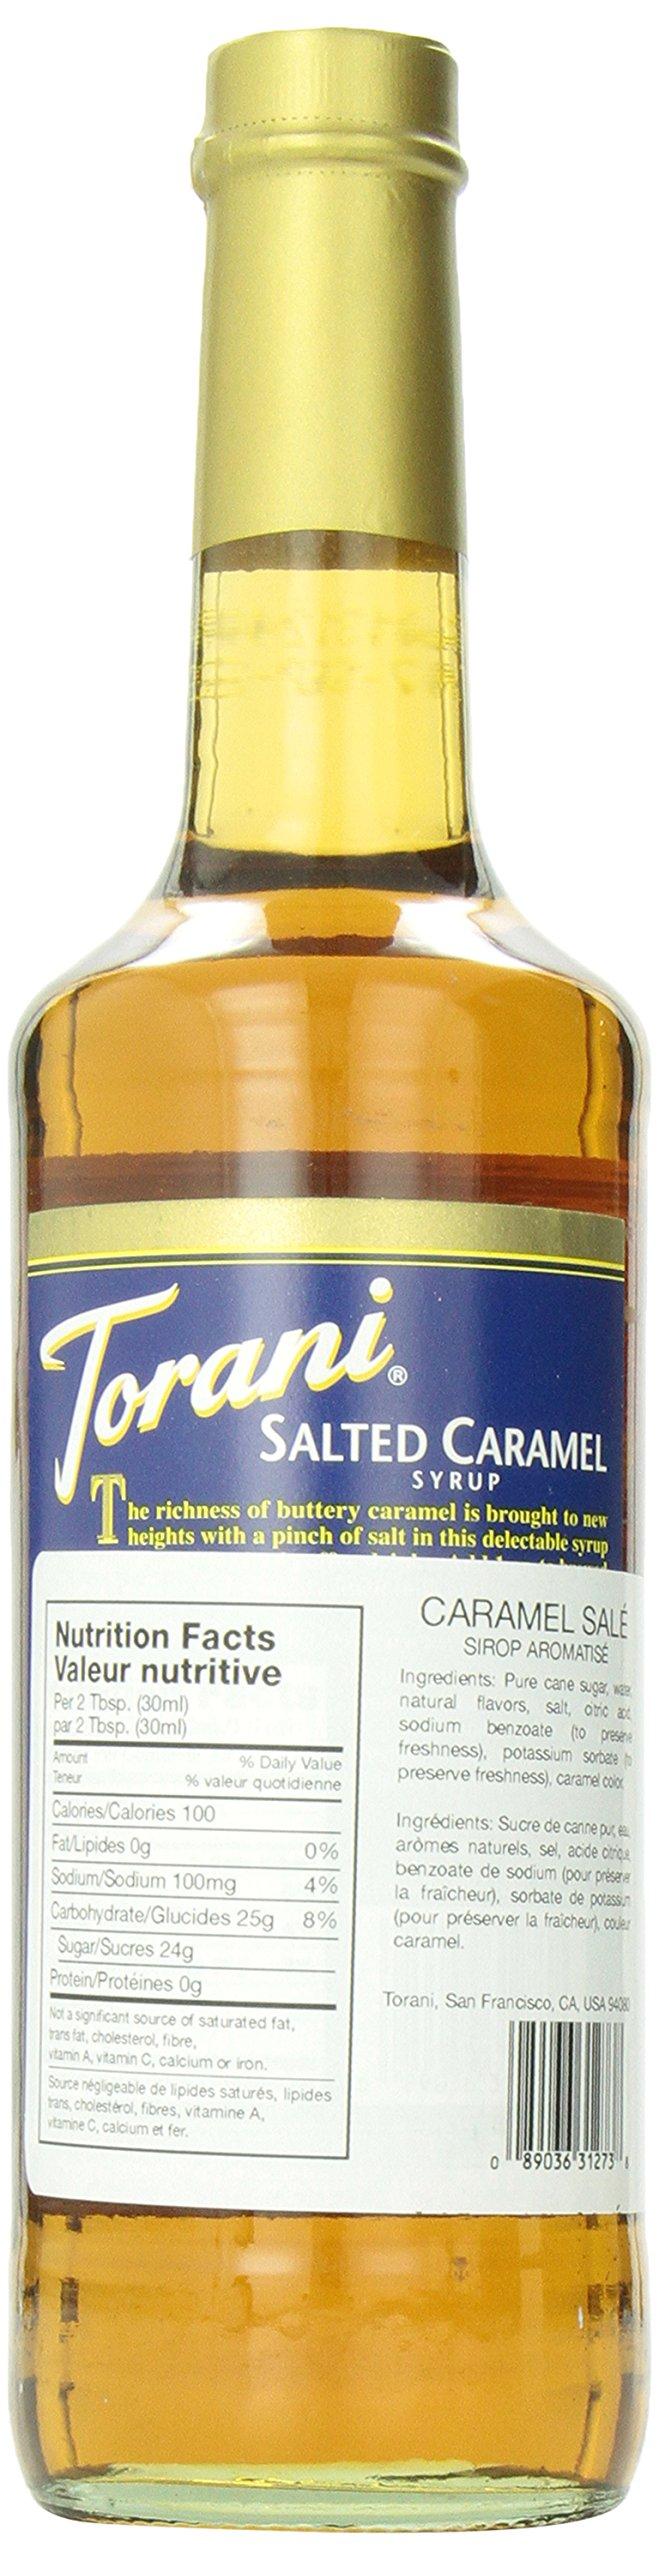 Torani Salted Caramel Syrup, 25.4 oz